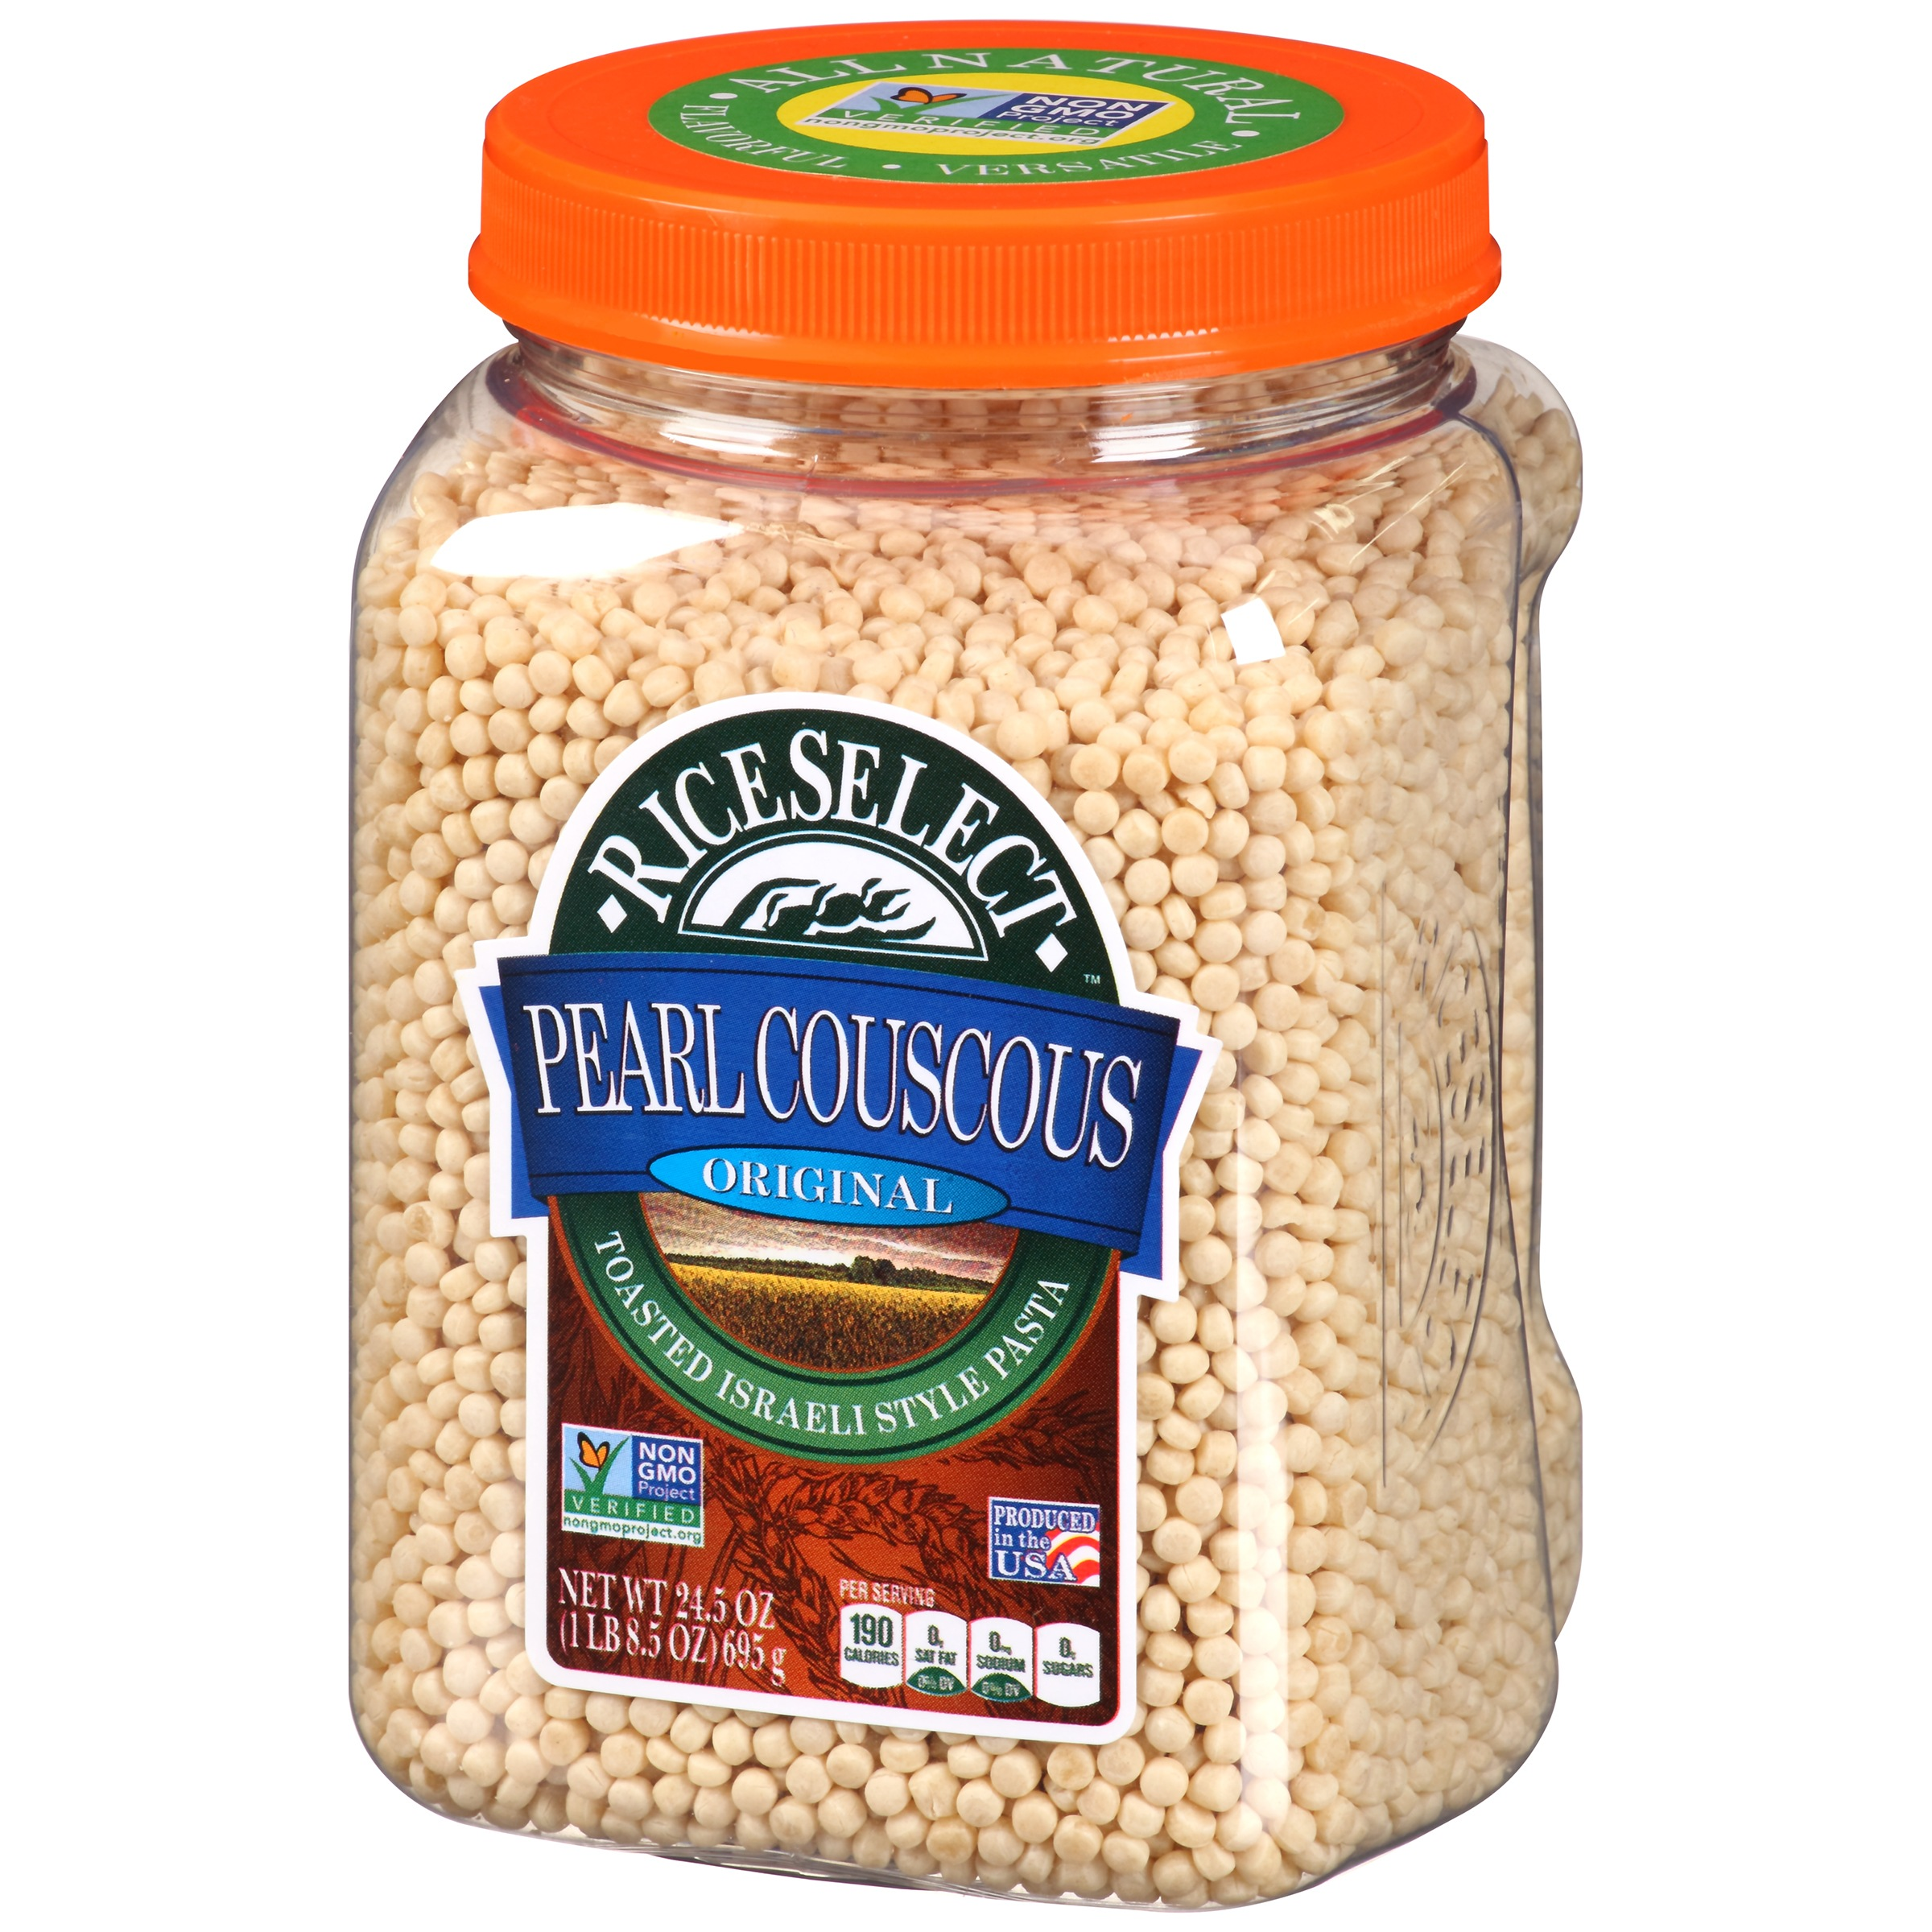 Riceselect Original Pearl Couscous 24 5 Oz Walmart Com Walmart Com